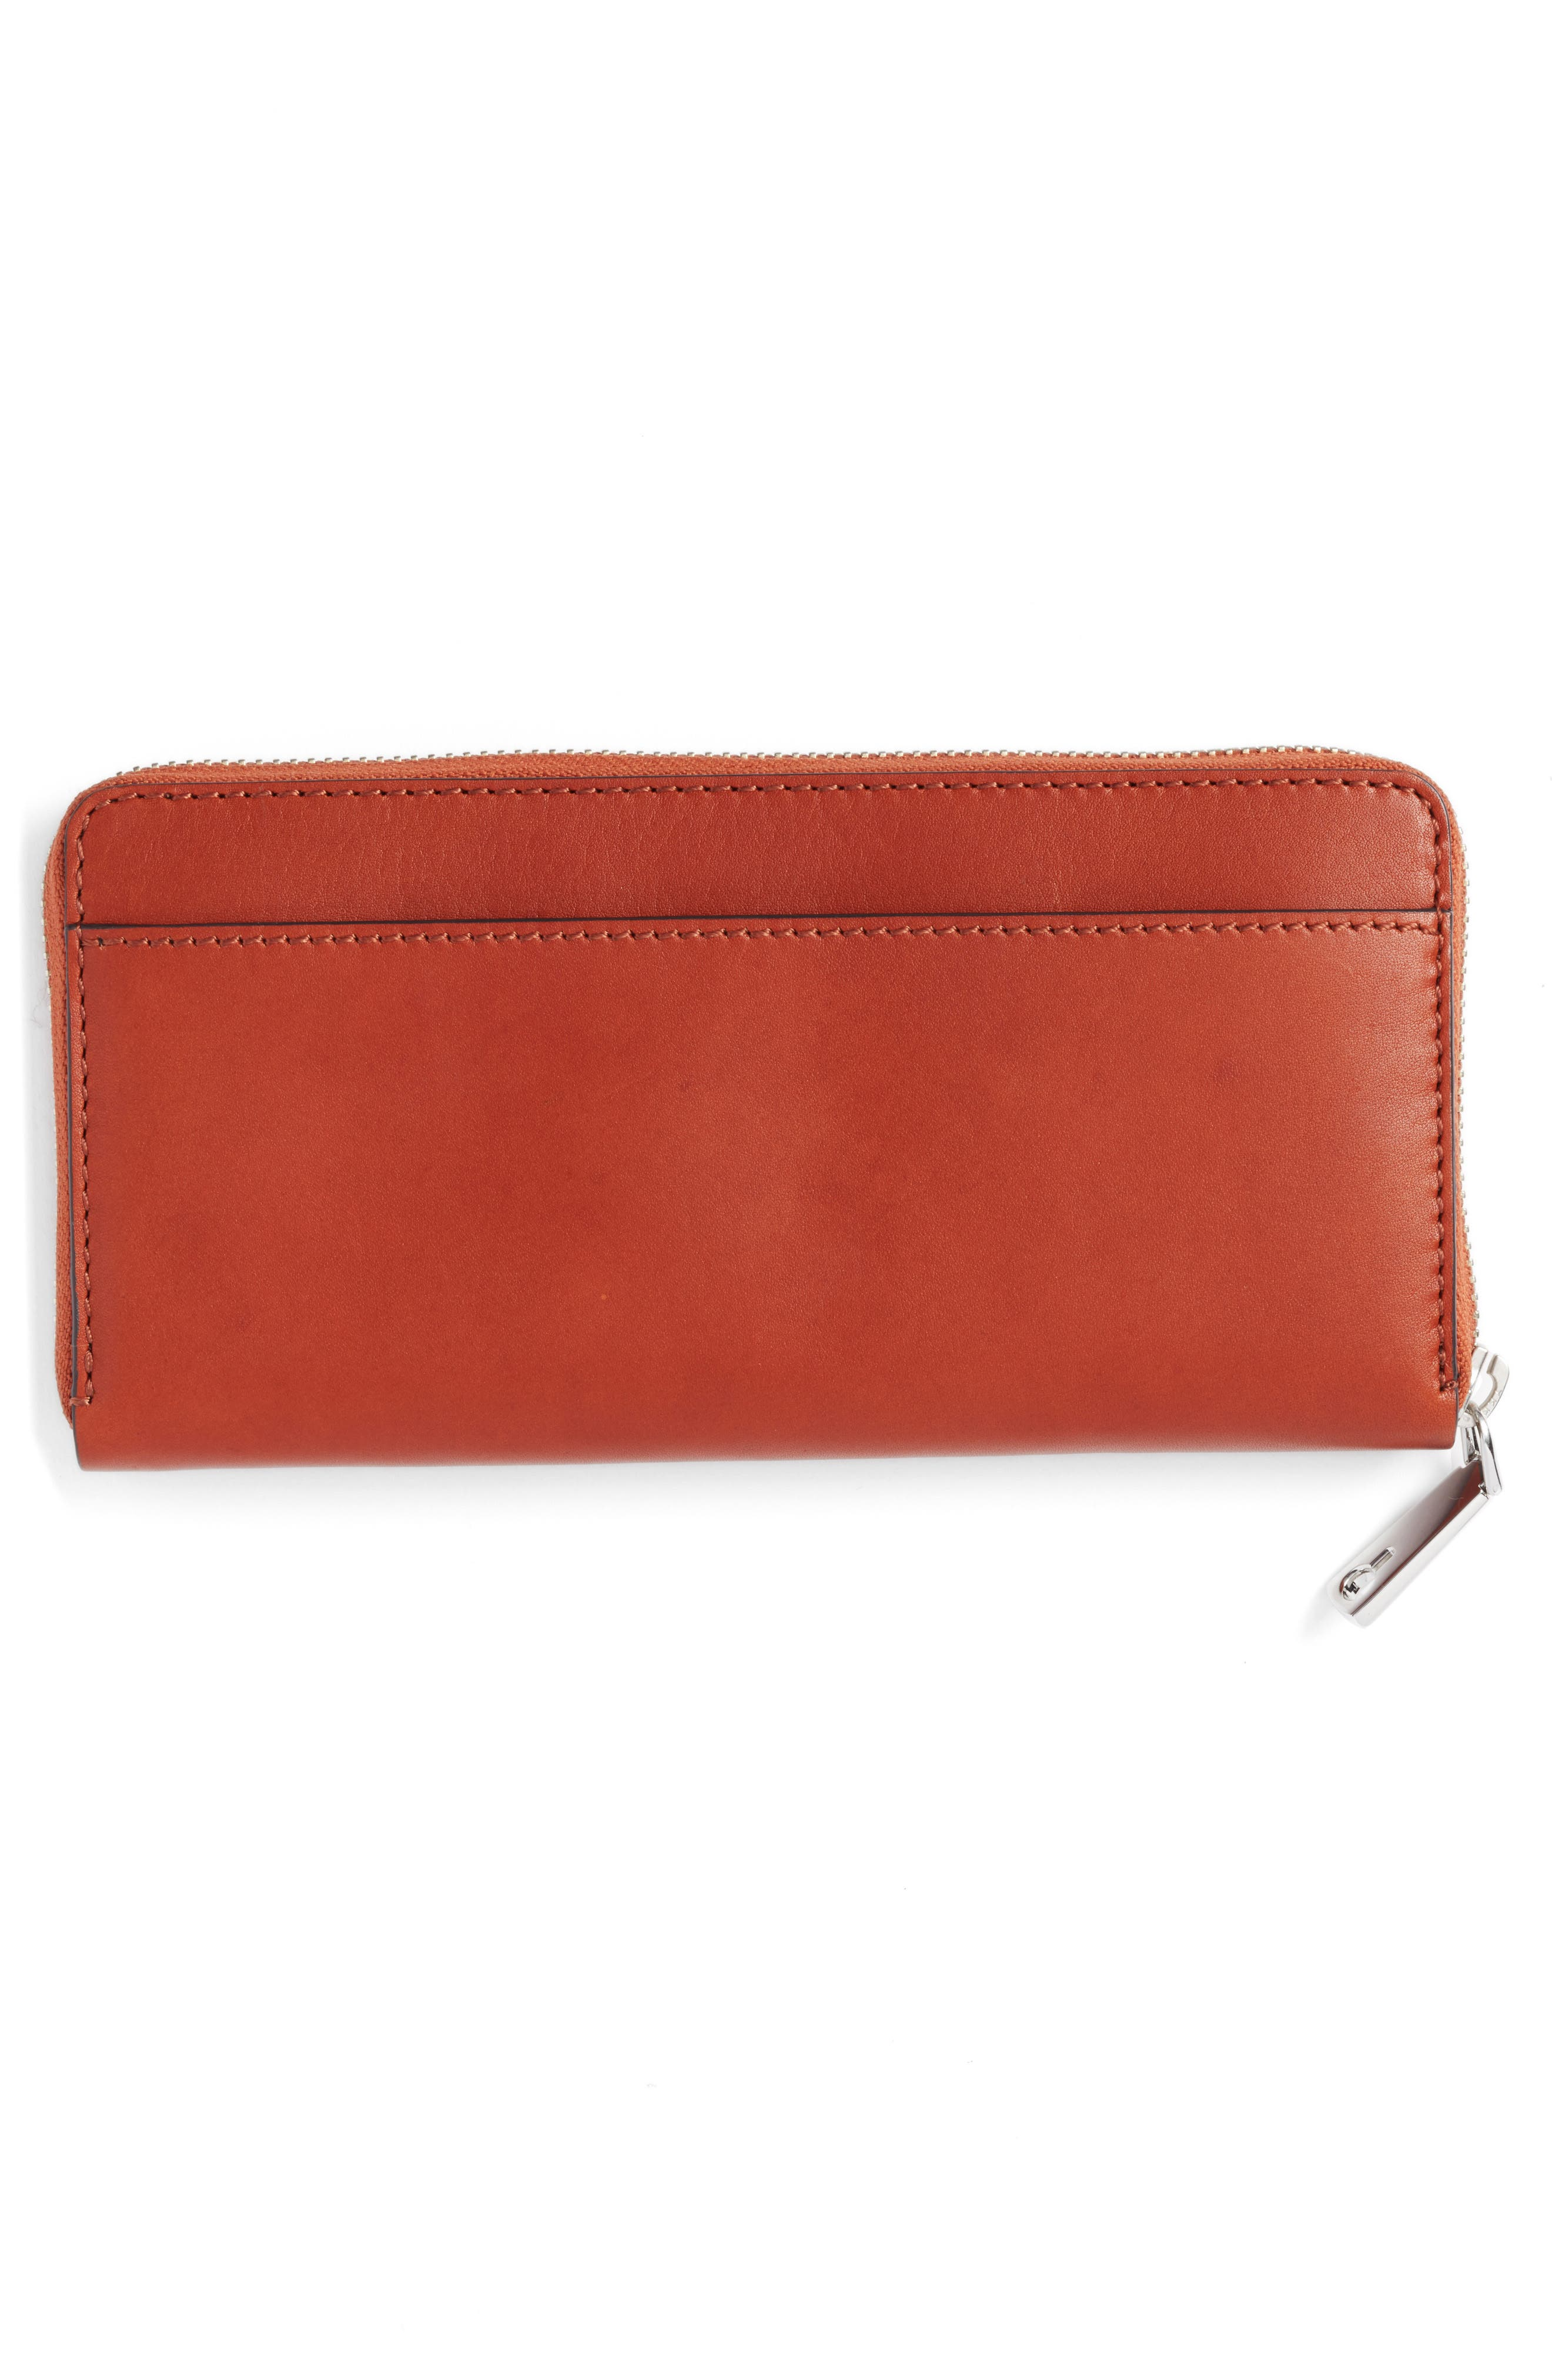 Continental Zip Wallet,                             Alternate thumbnail 6, color,